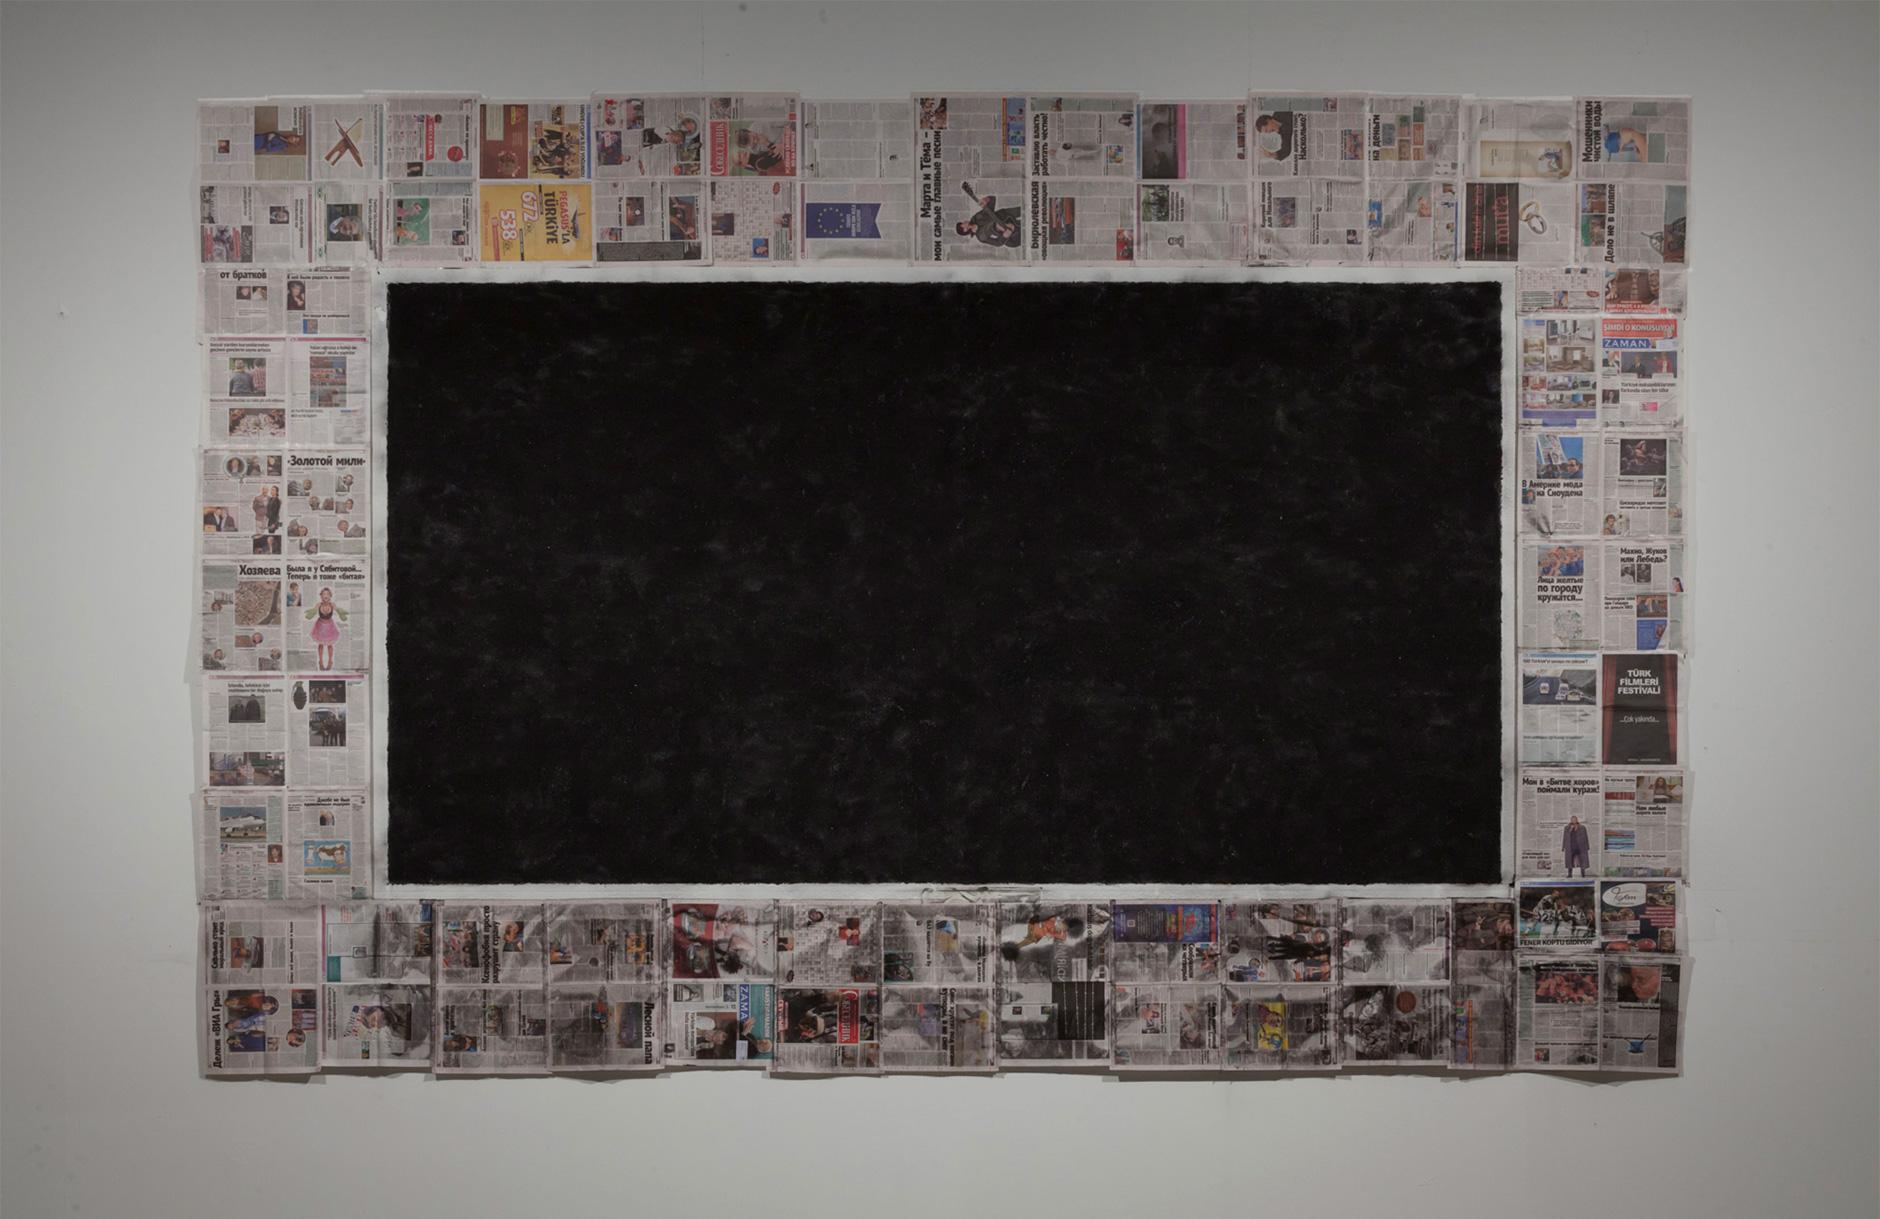 04-dream-screen-coal-blown-on-the-wall-photo-rauno-traskelin